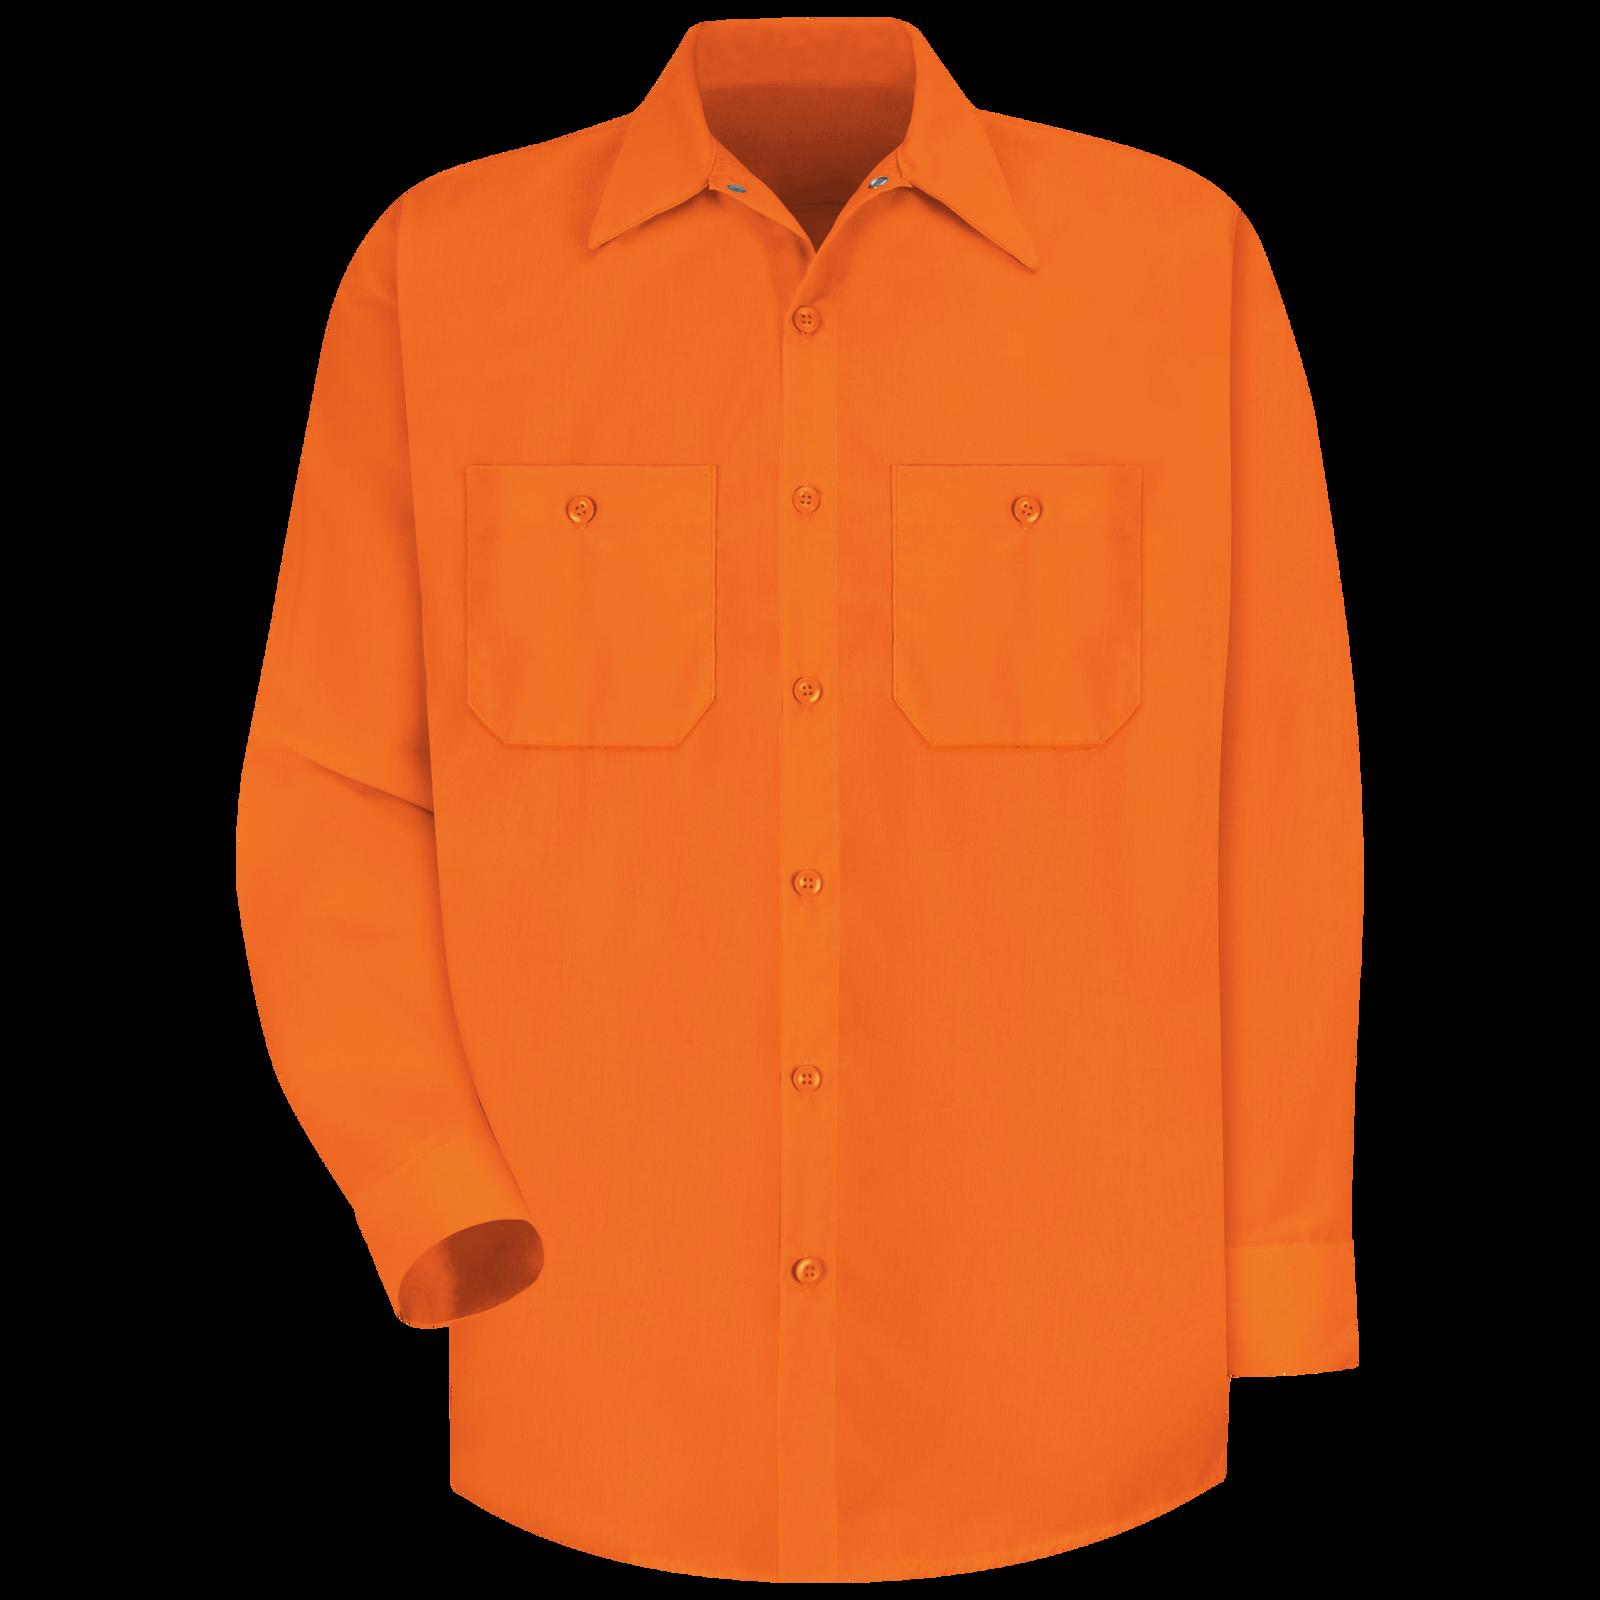 Details about  /Red Kap Mechanic Long Sleeve Shirt Gray /& Orange XL and Large